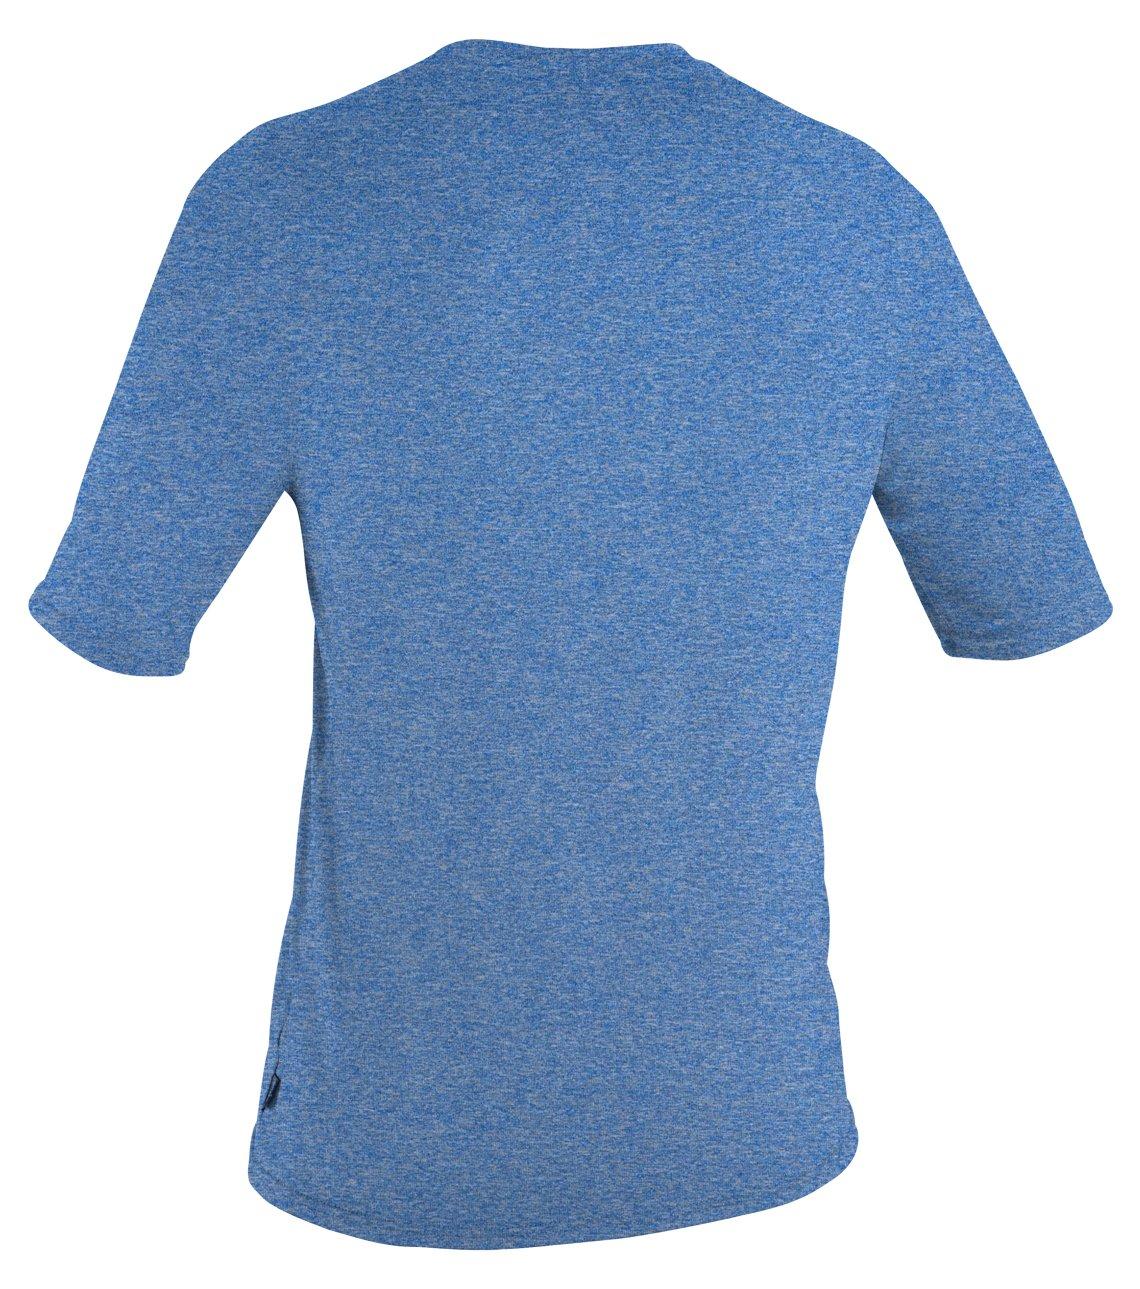 O'Neill  Men's Hybrid UPF 50+ Short Sleeve Sun Shirt, Blue,Small by O'Neill Wetsuits (Image #2)